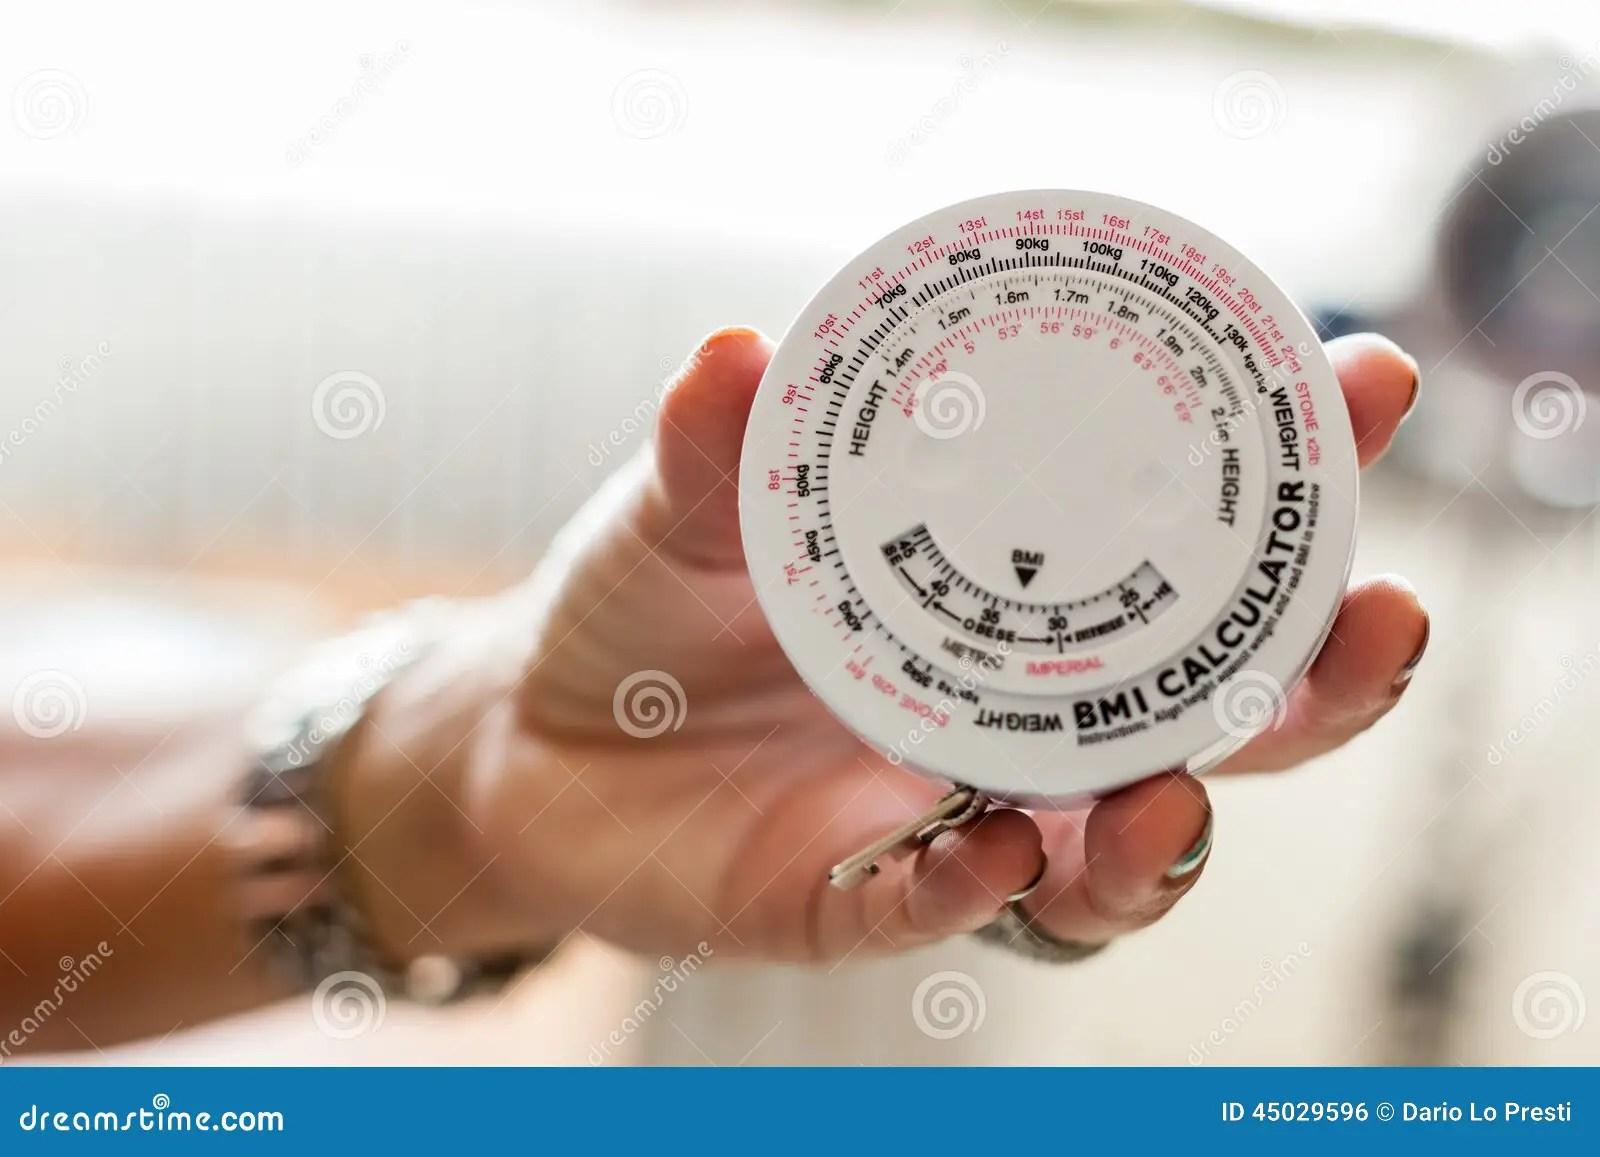 Bmi Calculator Stock Photo Image Of Nutritionist Lose